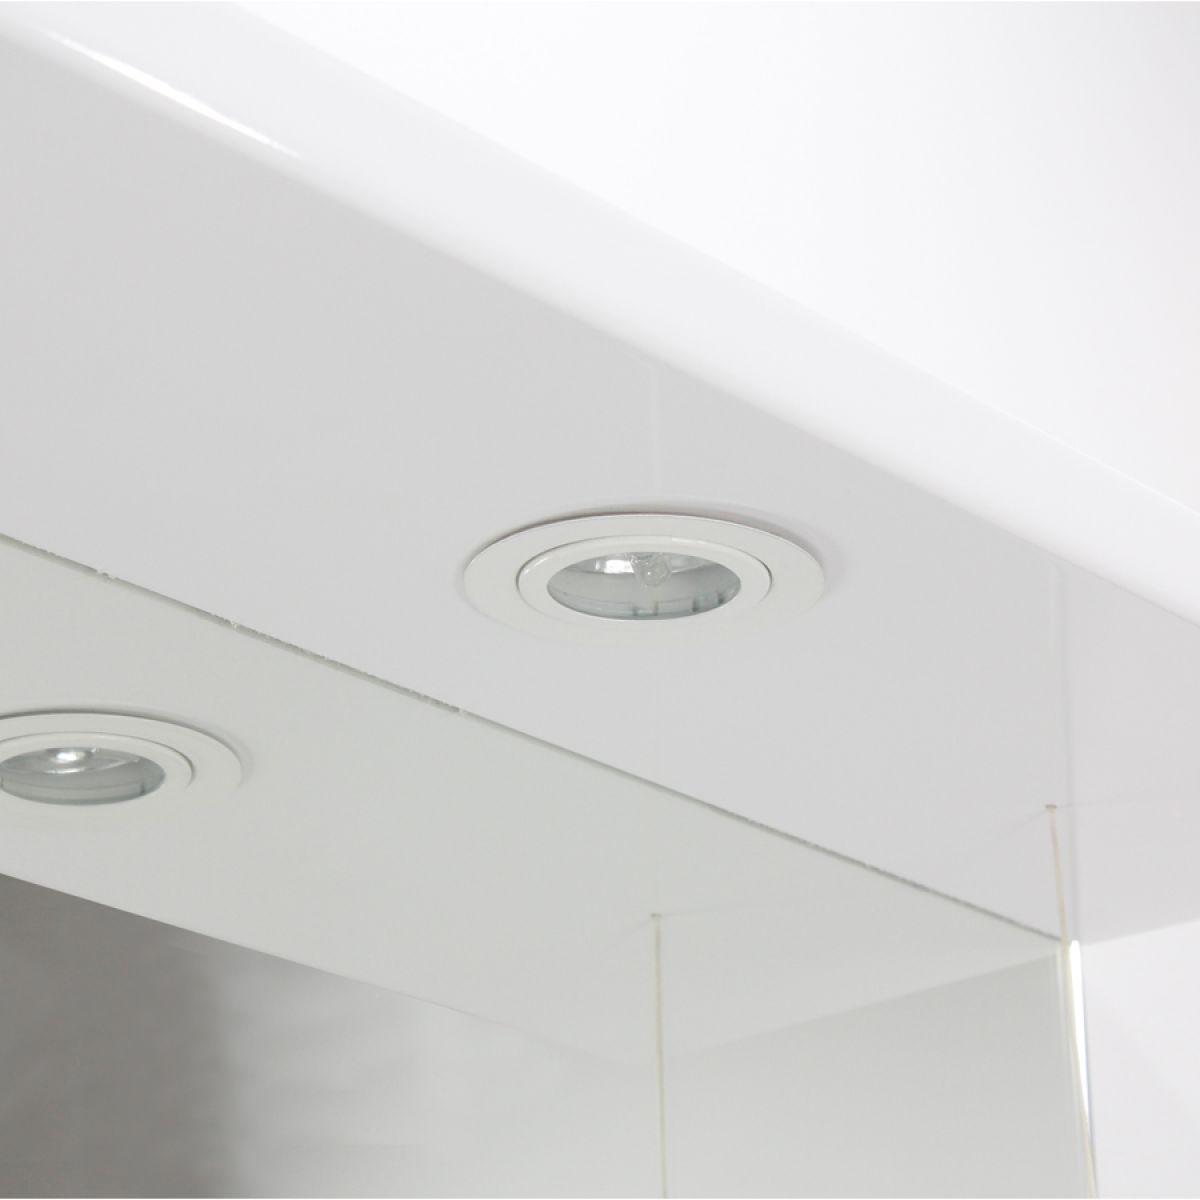 Premier High Gloss White Bathroom Mirror Cabinet Lights Off